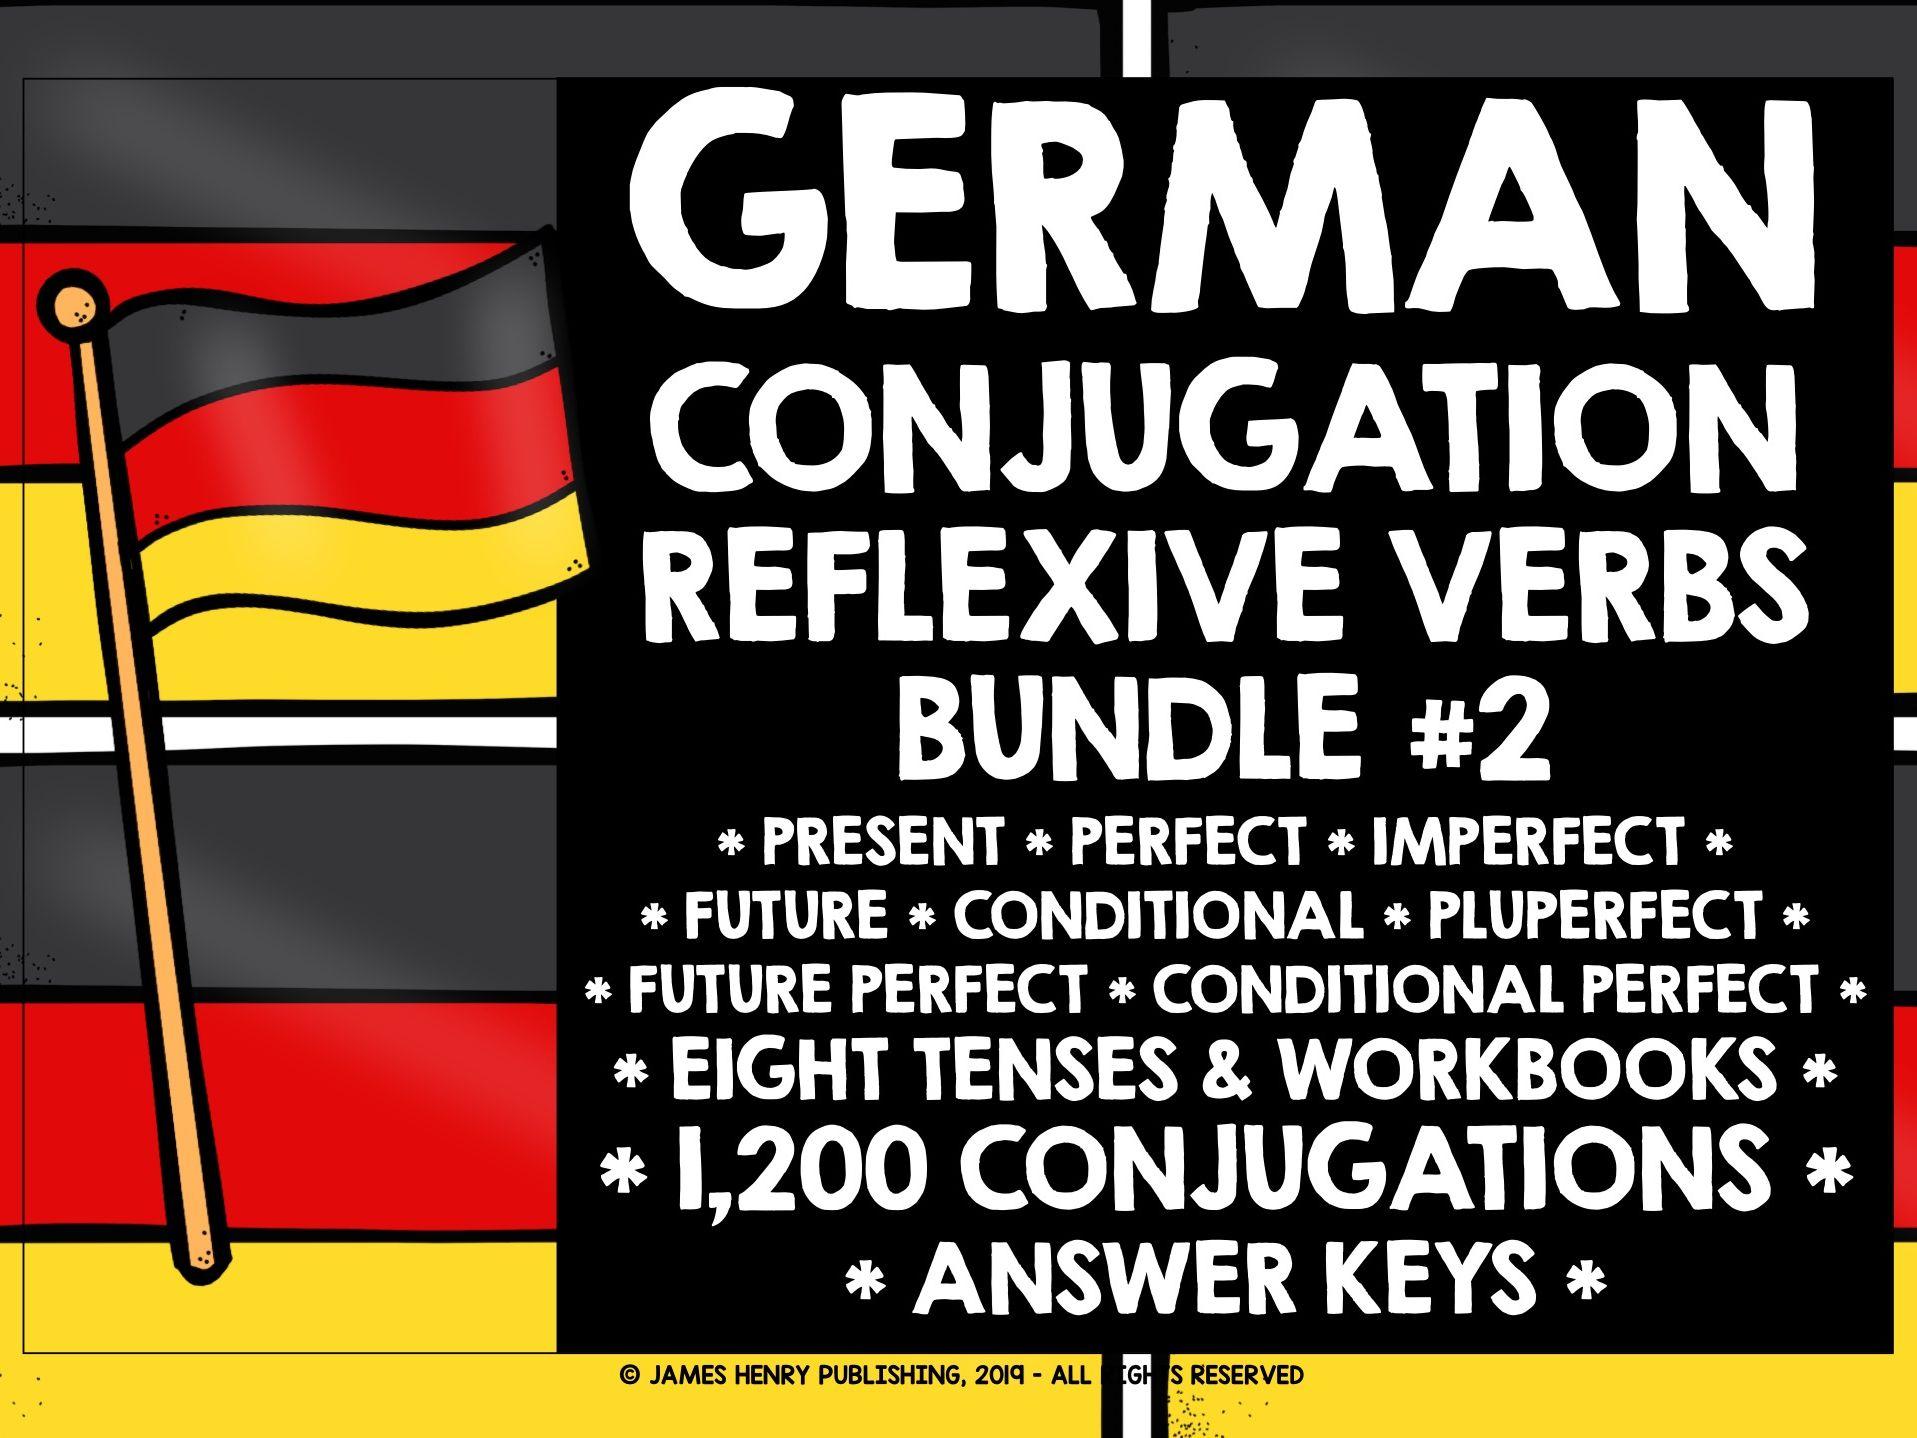 GERMAN REFLEXIVE VERBS CONJUGATION DRILLS BUNDLE #2